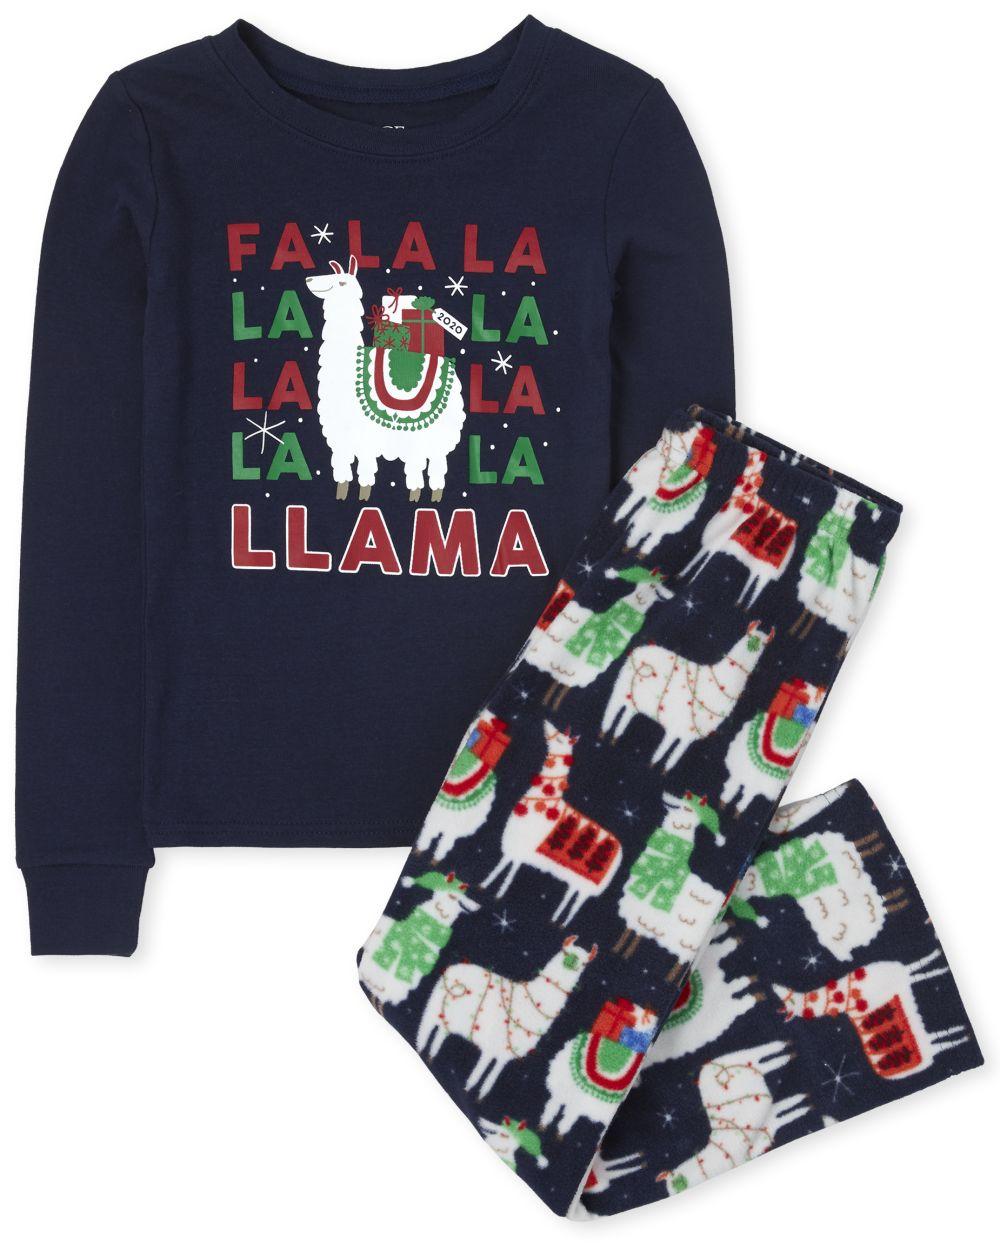 Unisex Kids Matching Family Festive Llama Snug Fit Cotton And Fleece Pajamas